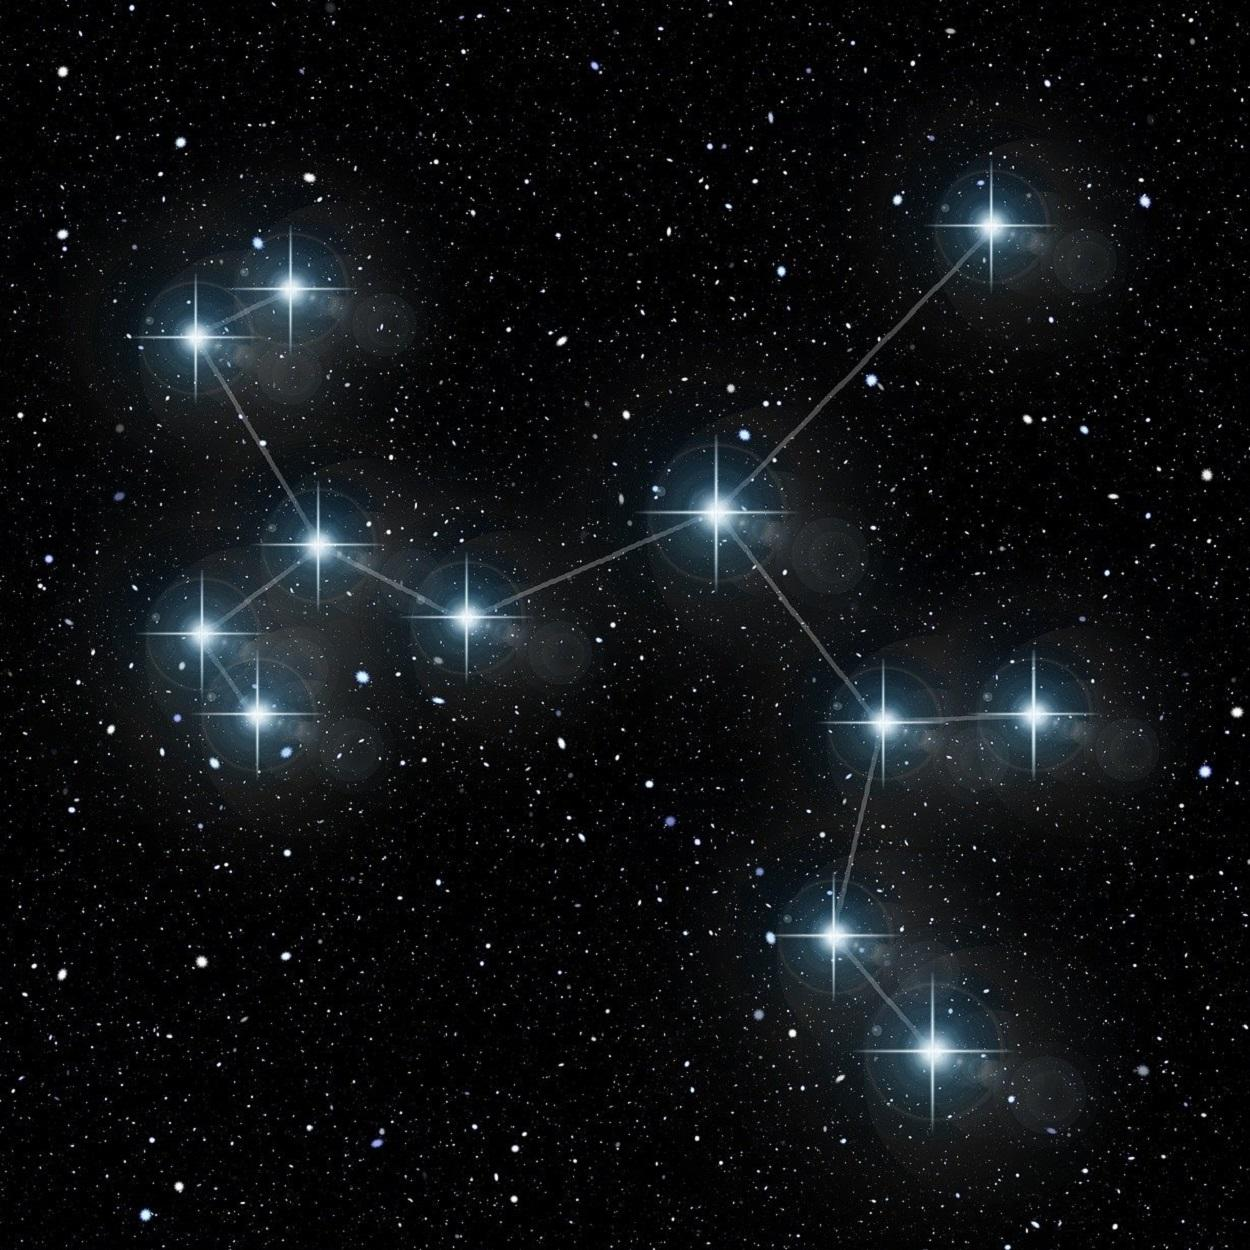 Céu no mapa astral